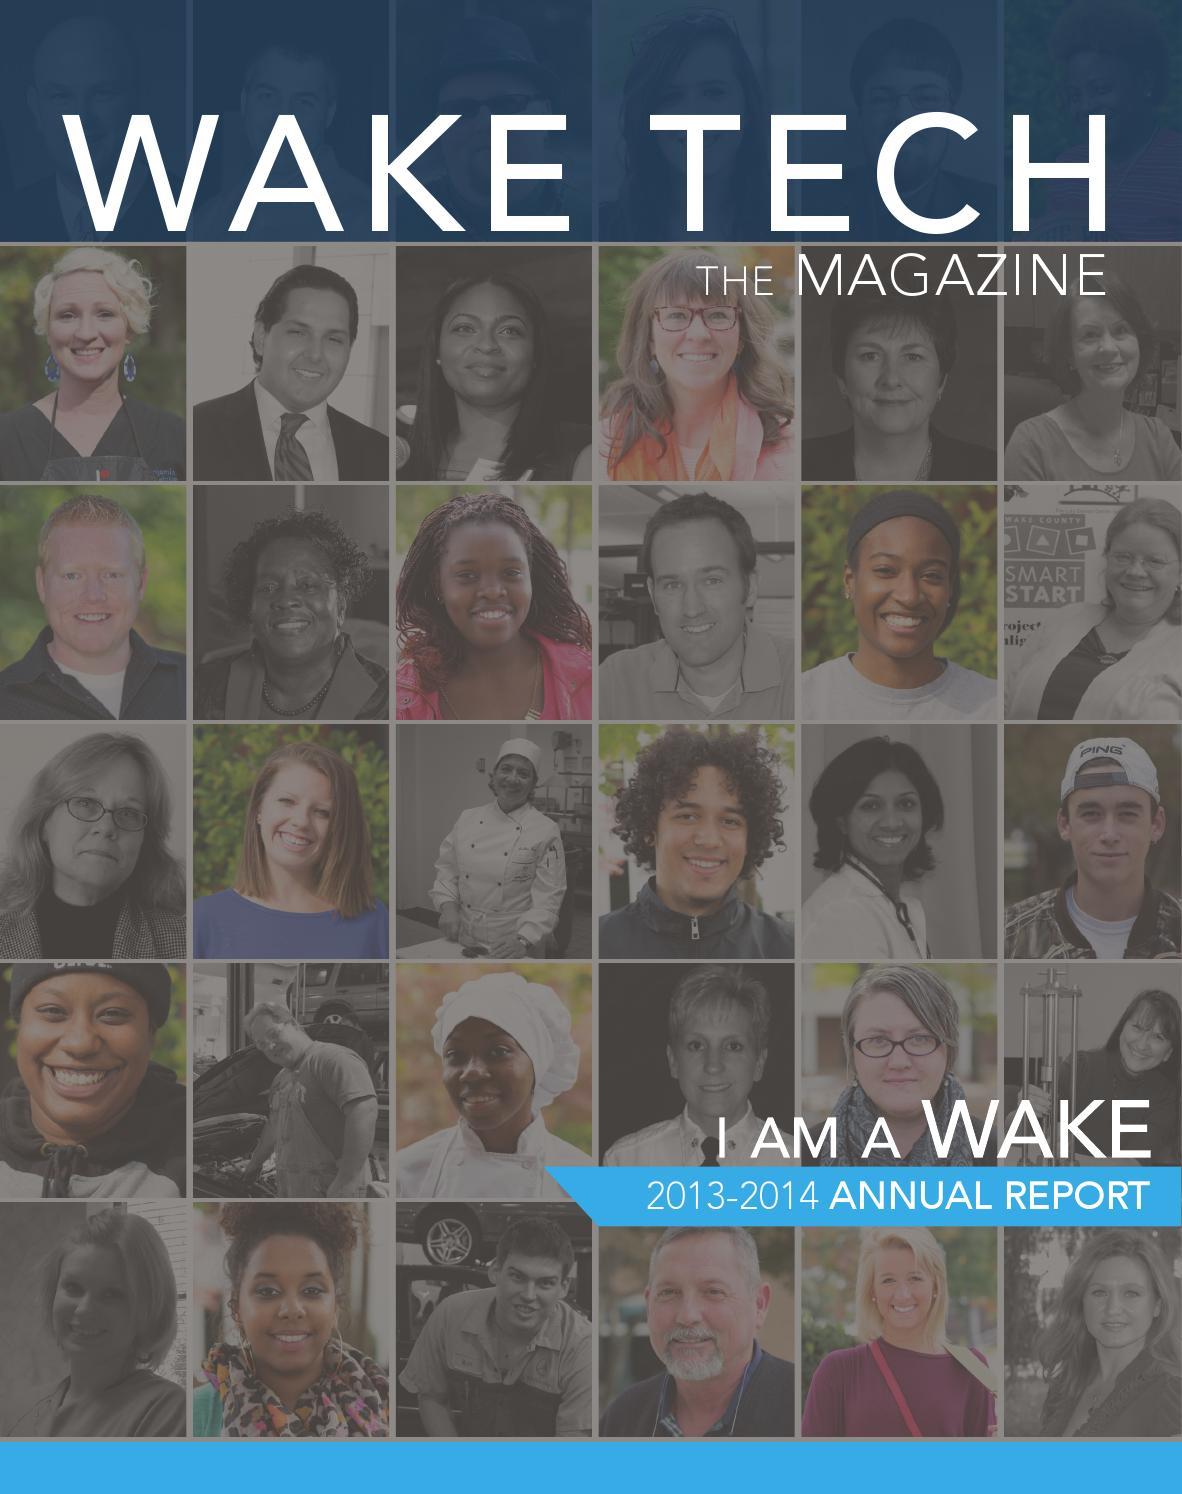 wake tech annual report 2013-2014 by Wake Tech Community College - issuu